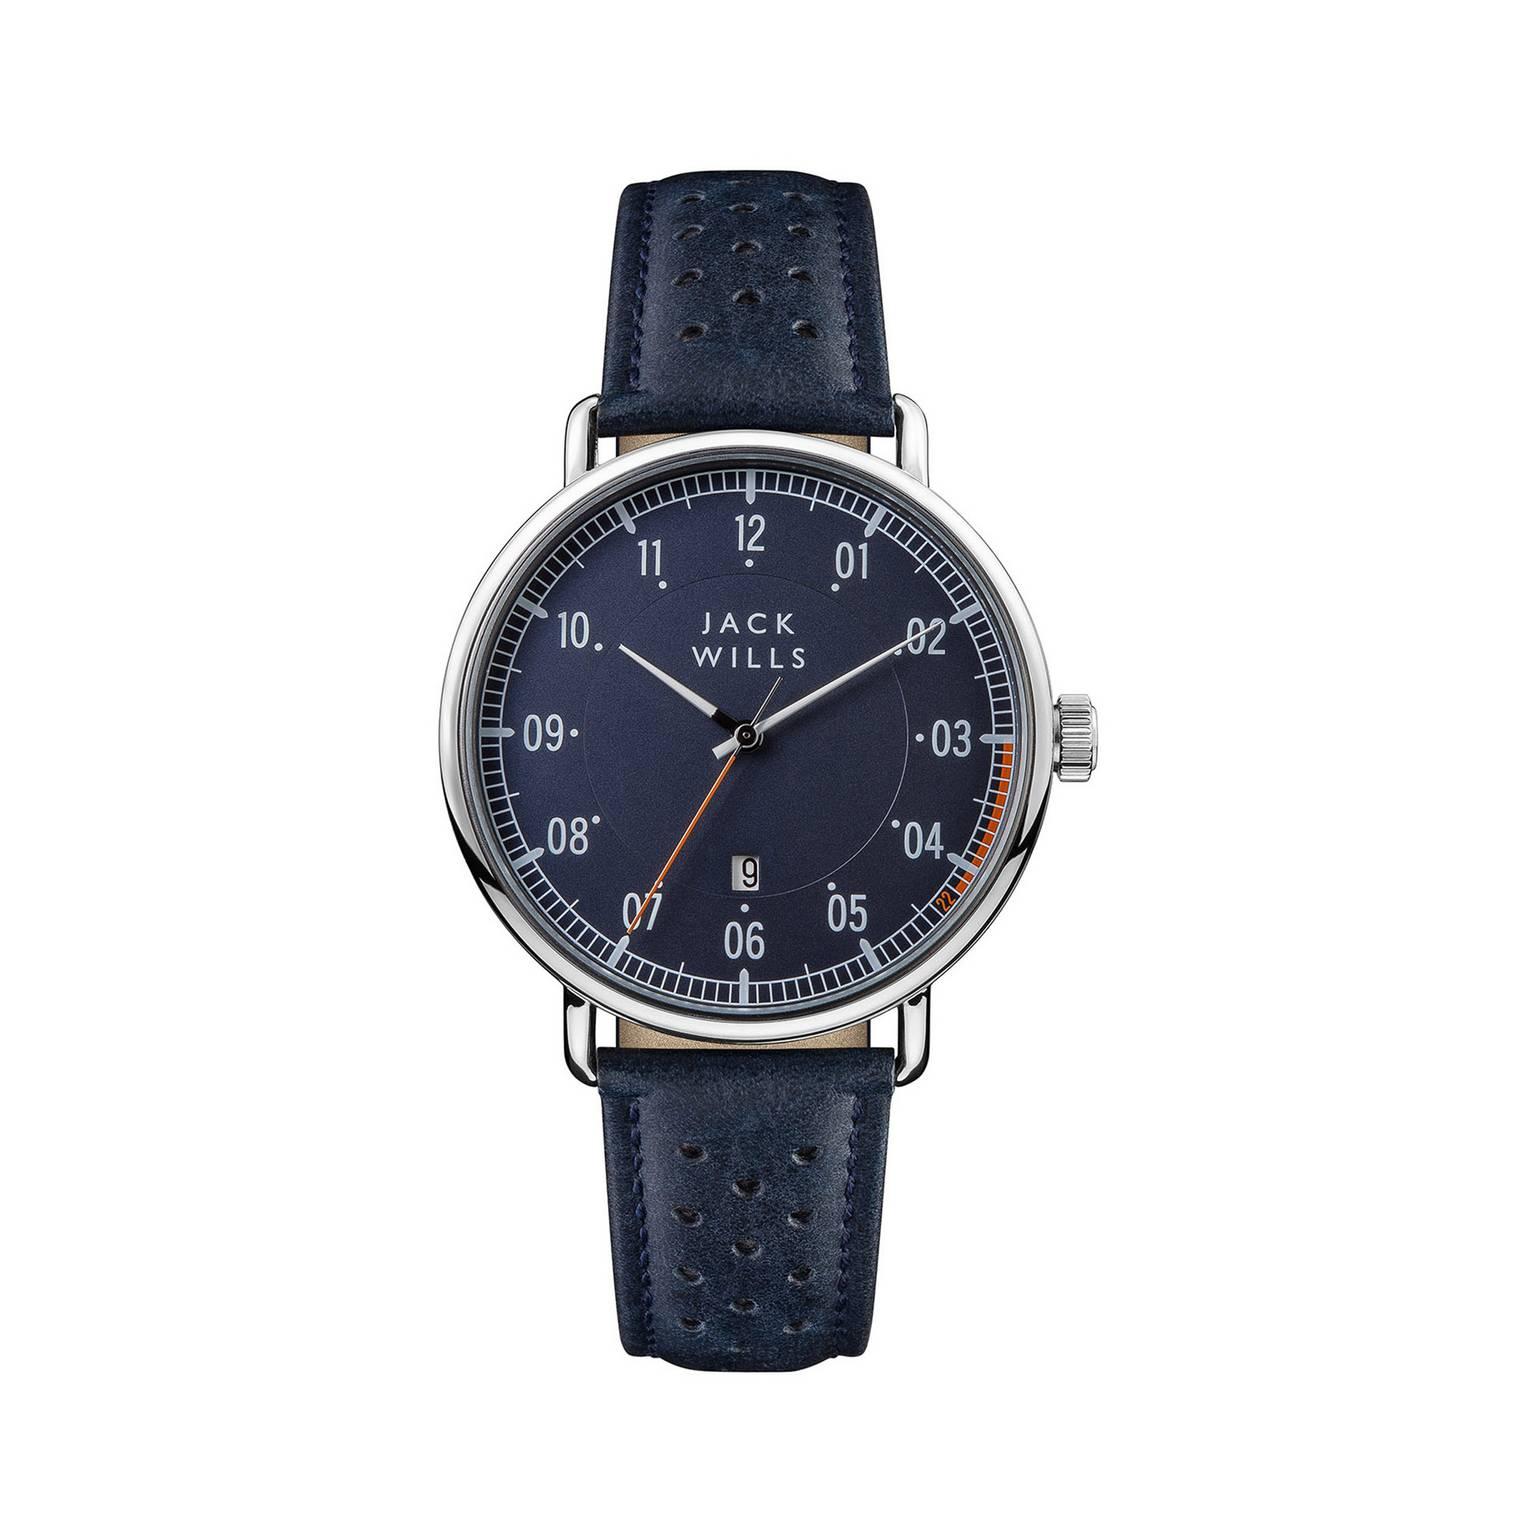 Jack Wills - Blue 'Acland' Mens Fashion Watch - JW003BLBL £22.50 + £3.49 delivery at Debenhams